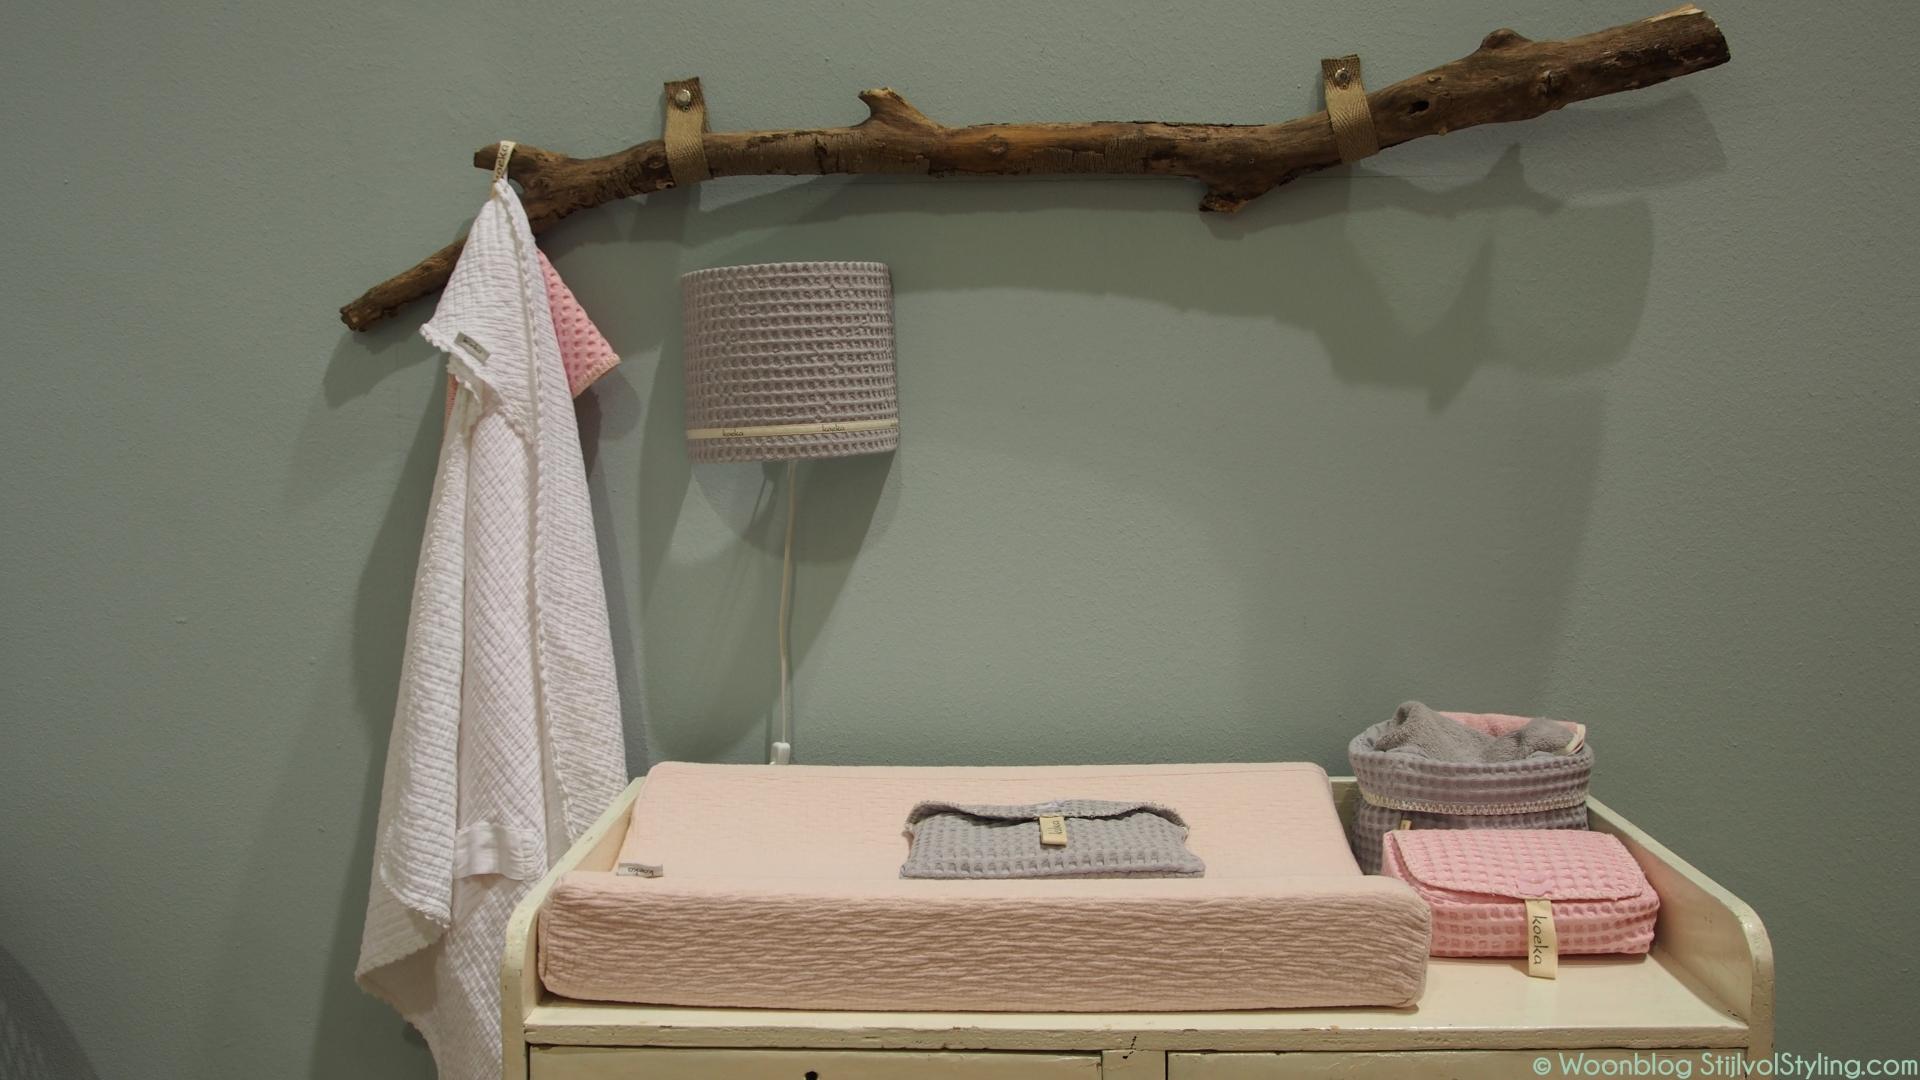 Interieur kids kleine babykamer inrichten tips en trucs stijlvol styling woonblog - Thema slaapkamer meisje ...